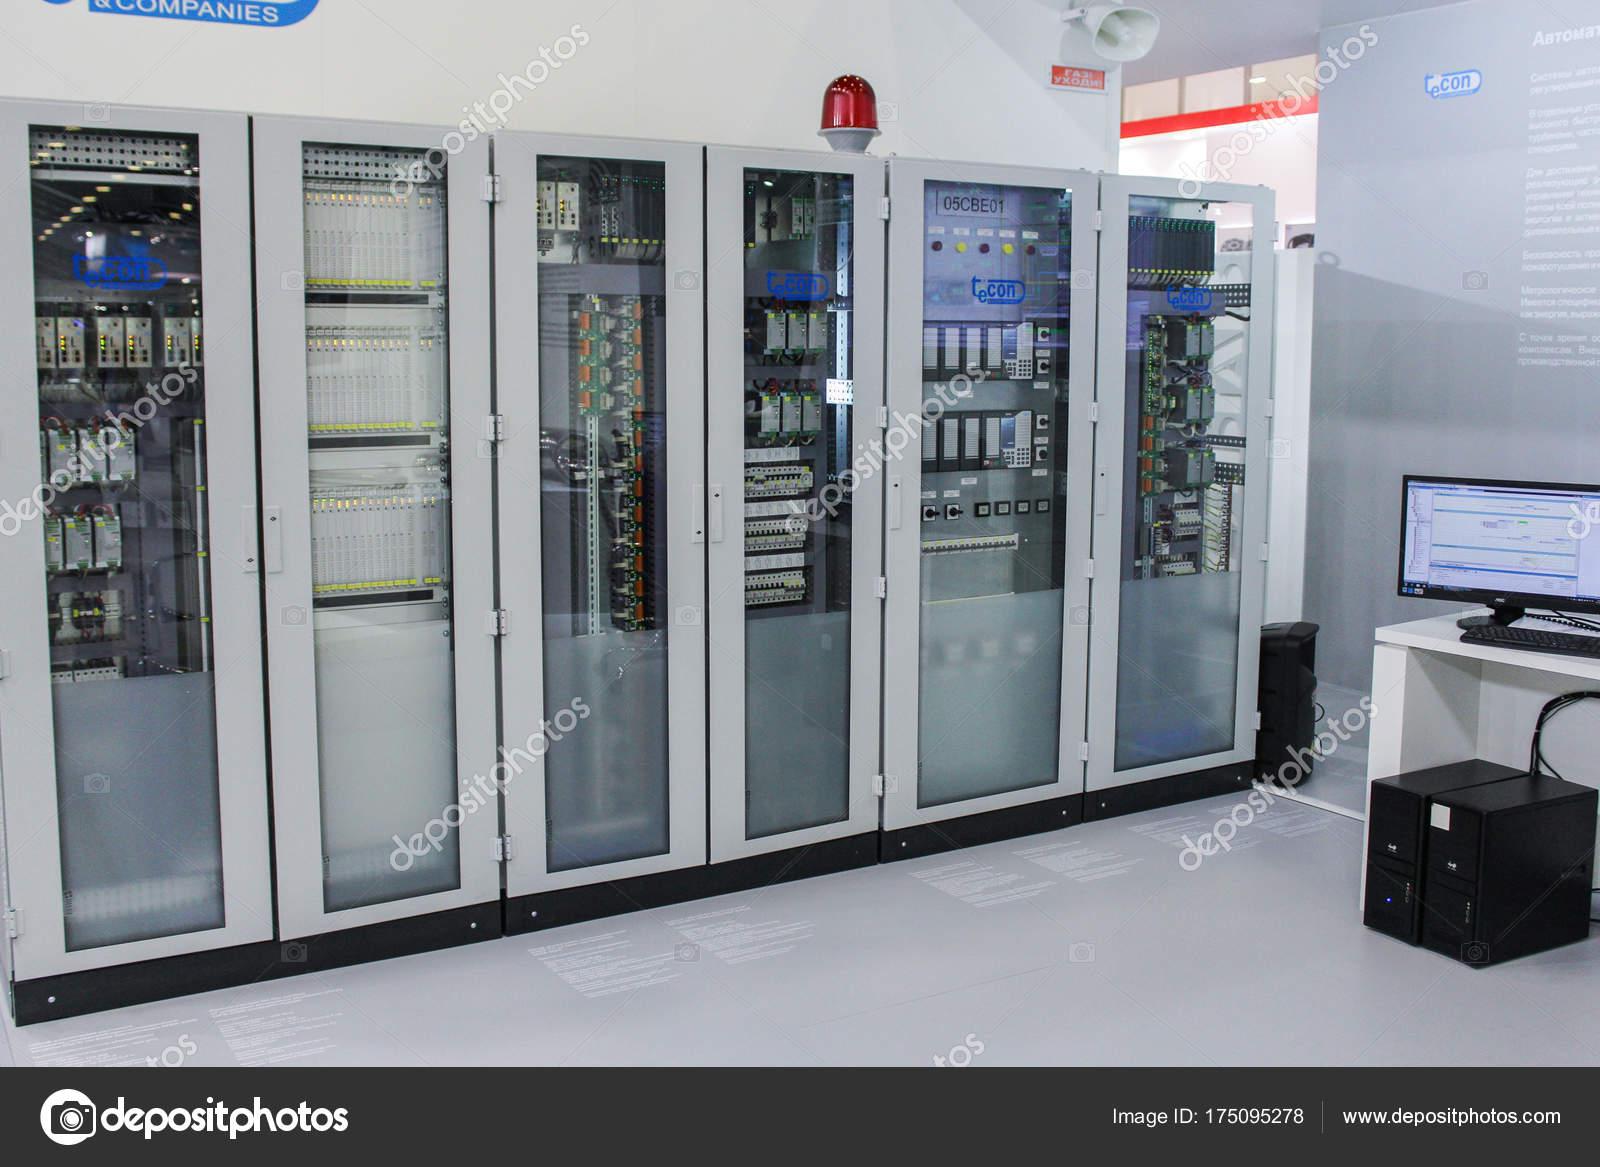 Serverschränke des Kontrollsystems — Redaktionelles Stockfoto ...